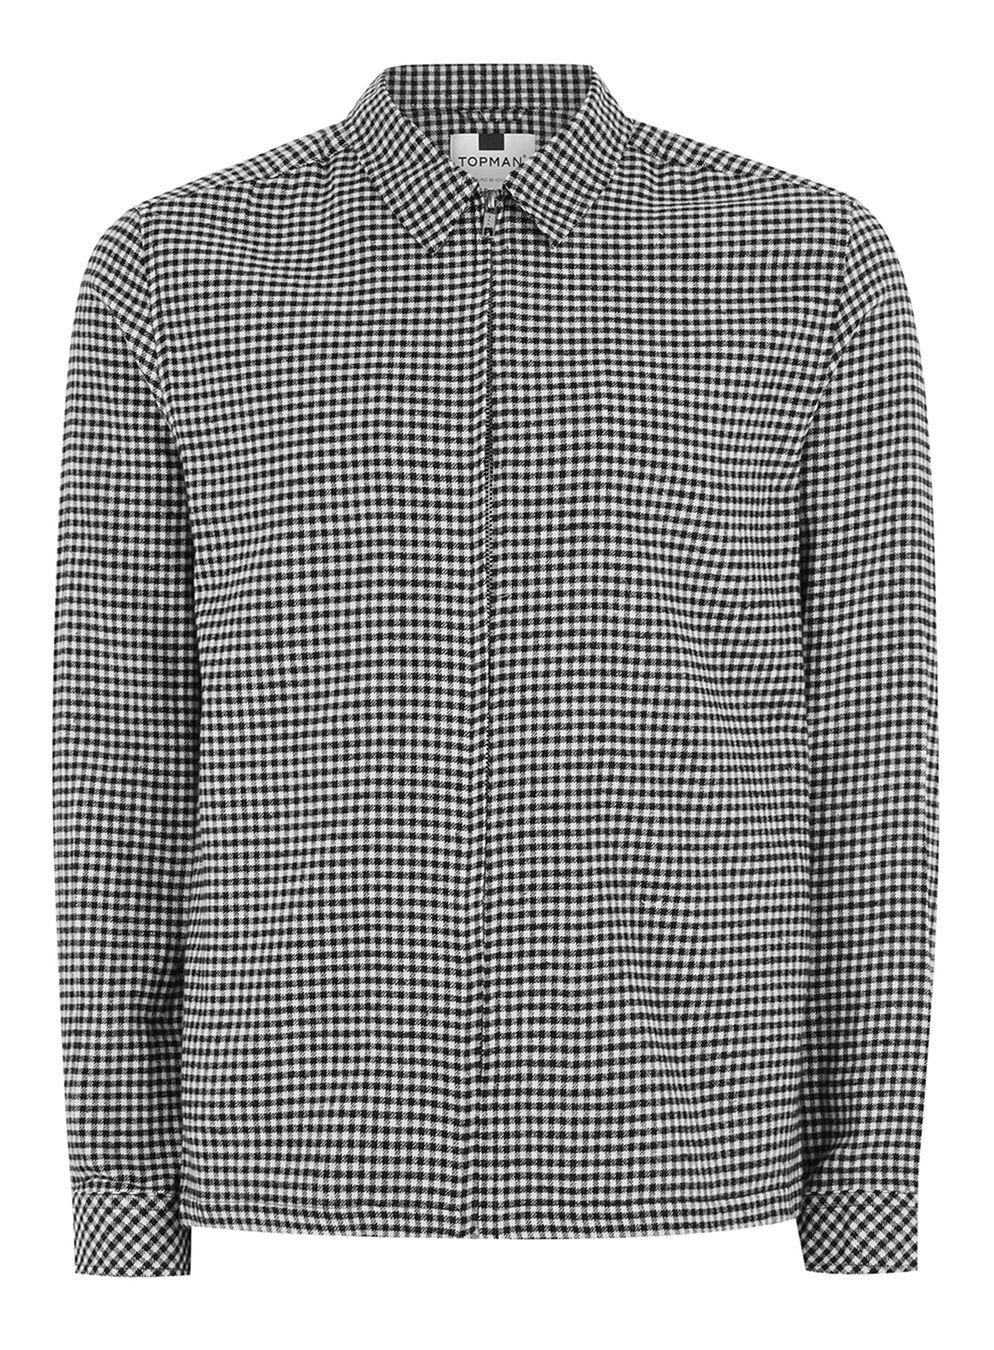 Lyst topman onyx black gingham check shirt in black for men for Black and white check mens shirt